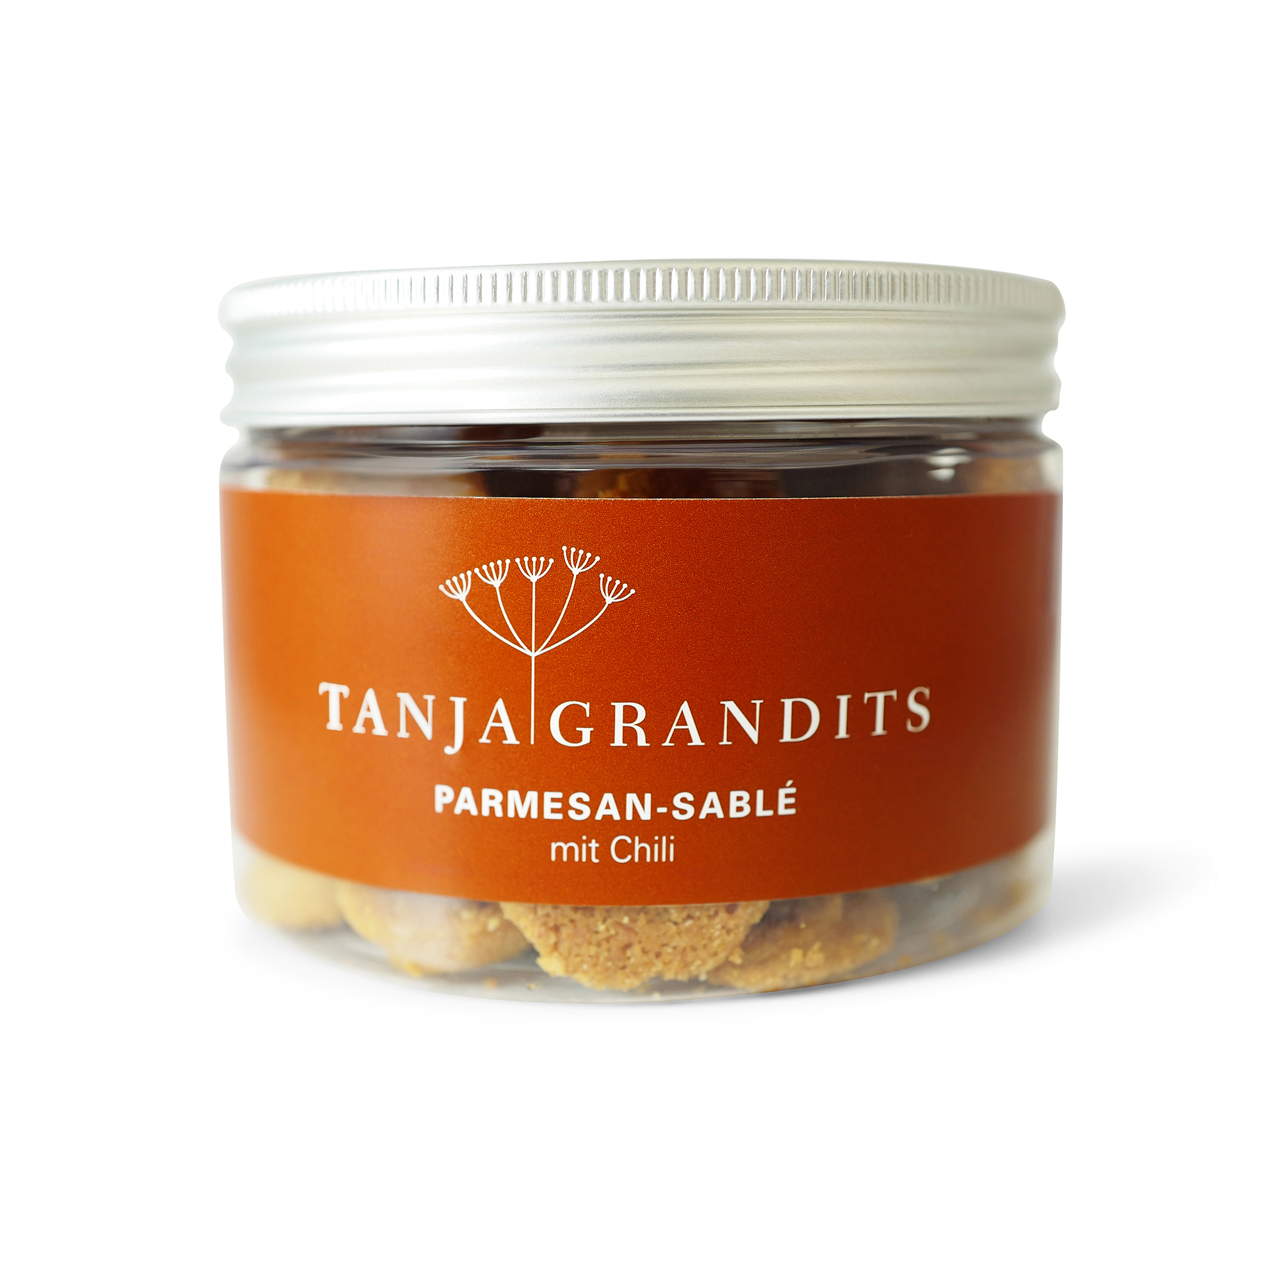 Tanja Grandits: Parmesan Sablé mit Chili